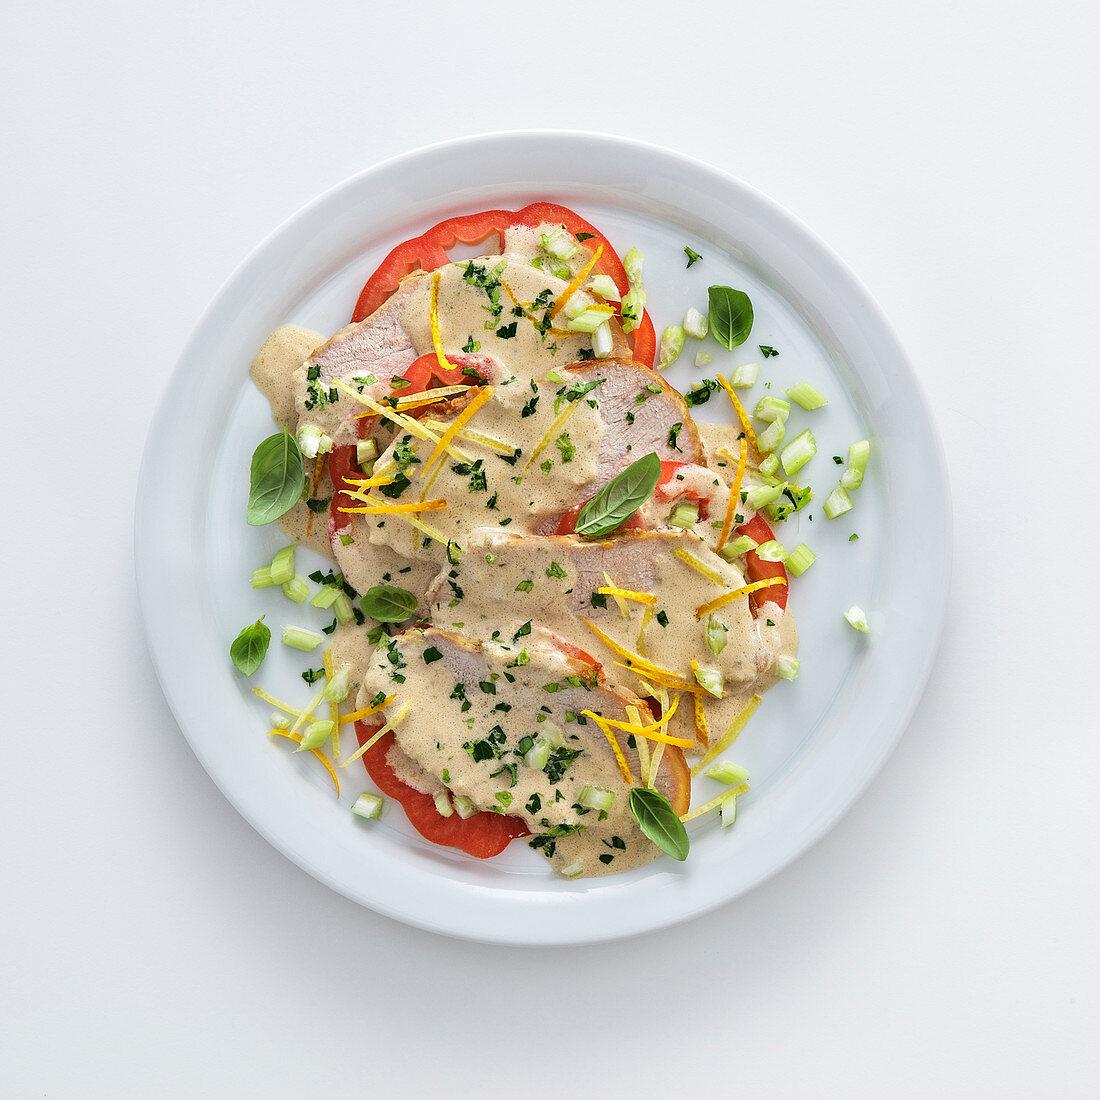 Roast veal with tuna fish sauce on beefsteak tomatoes